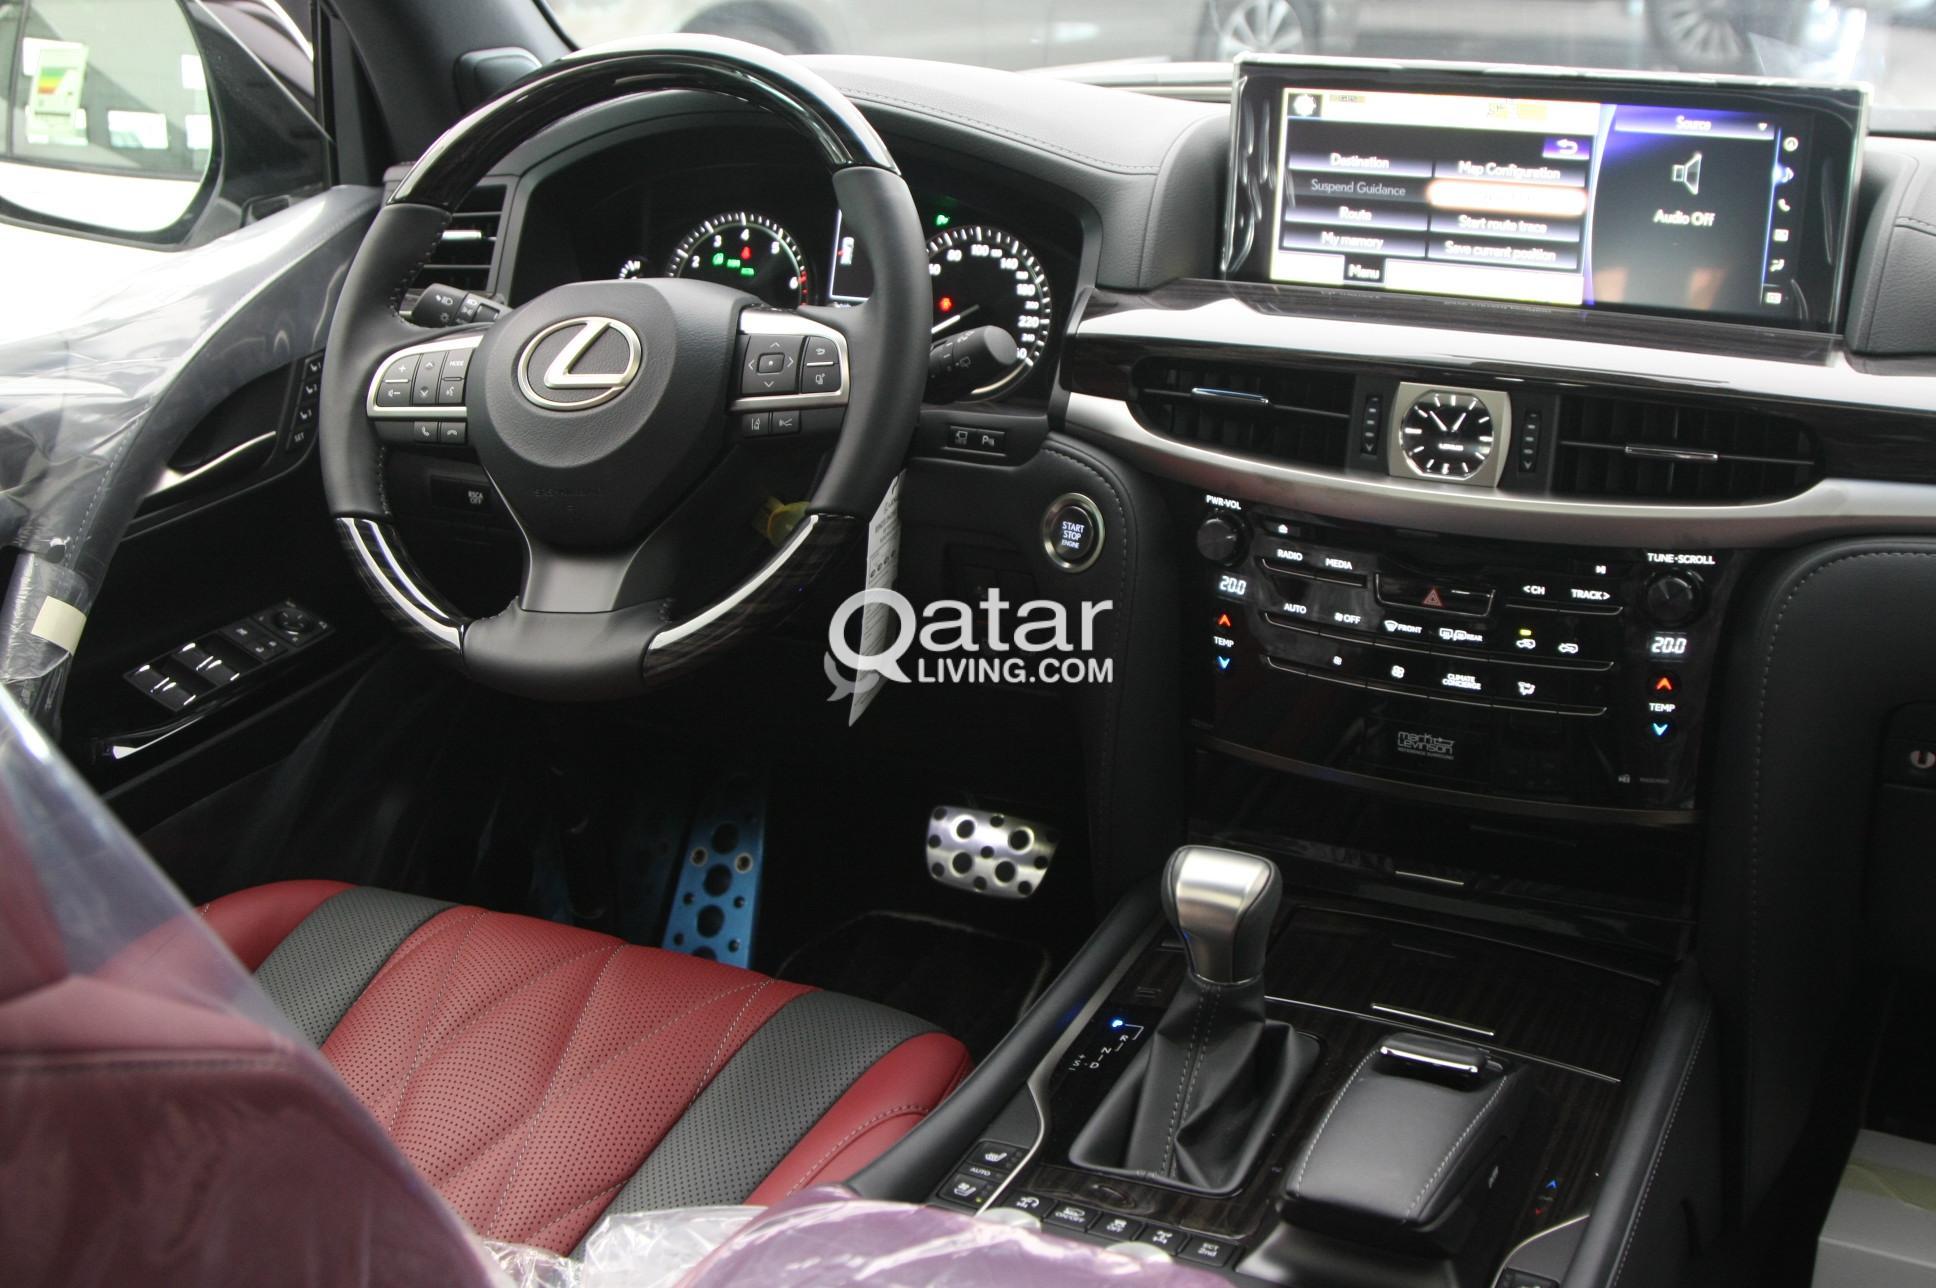 Lx 570 Black Edition Lexus Lx 570 Black Edition Kuro 5 7l A